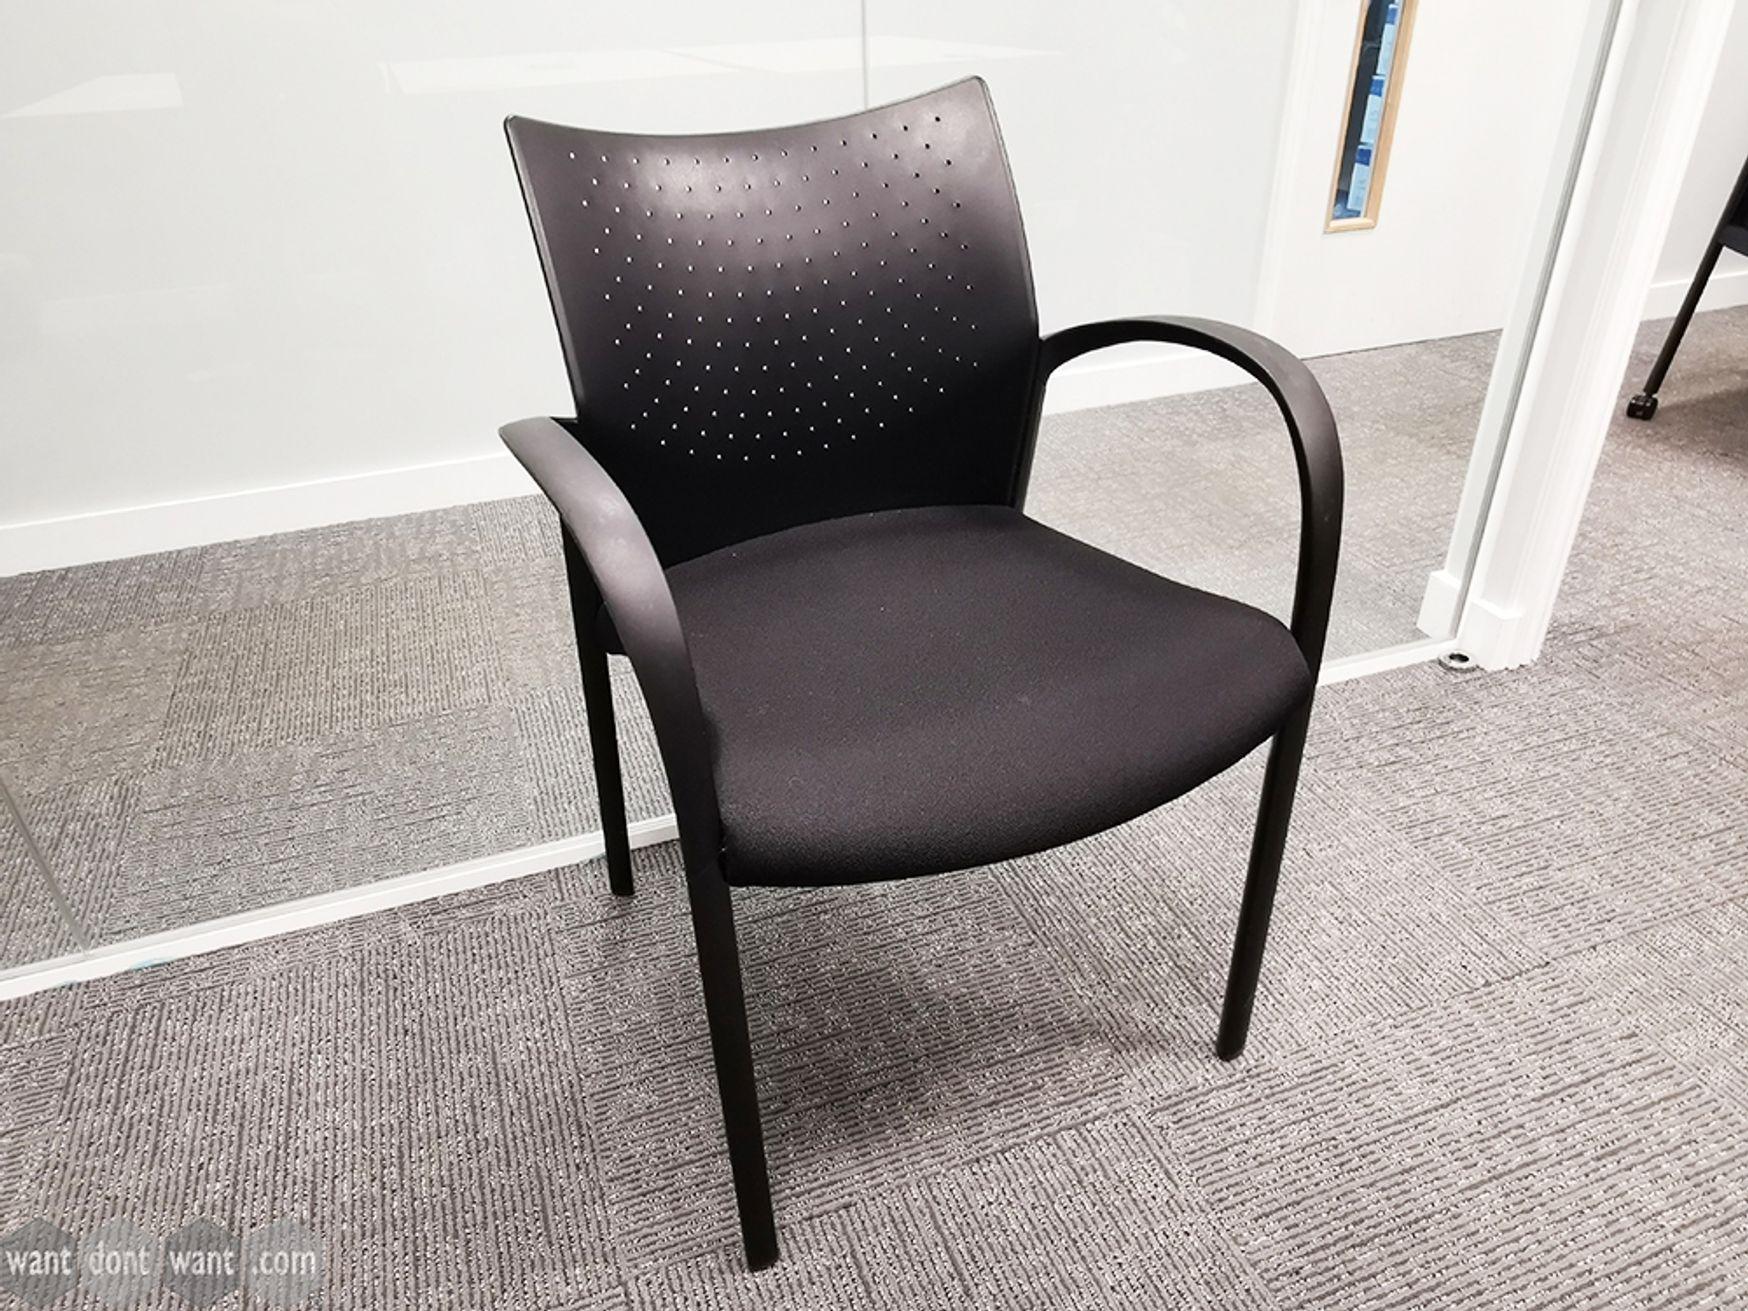 Used Senator Trillipse Chairs